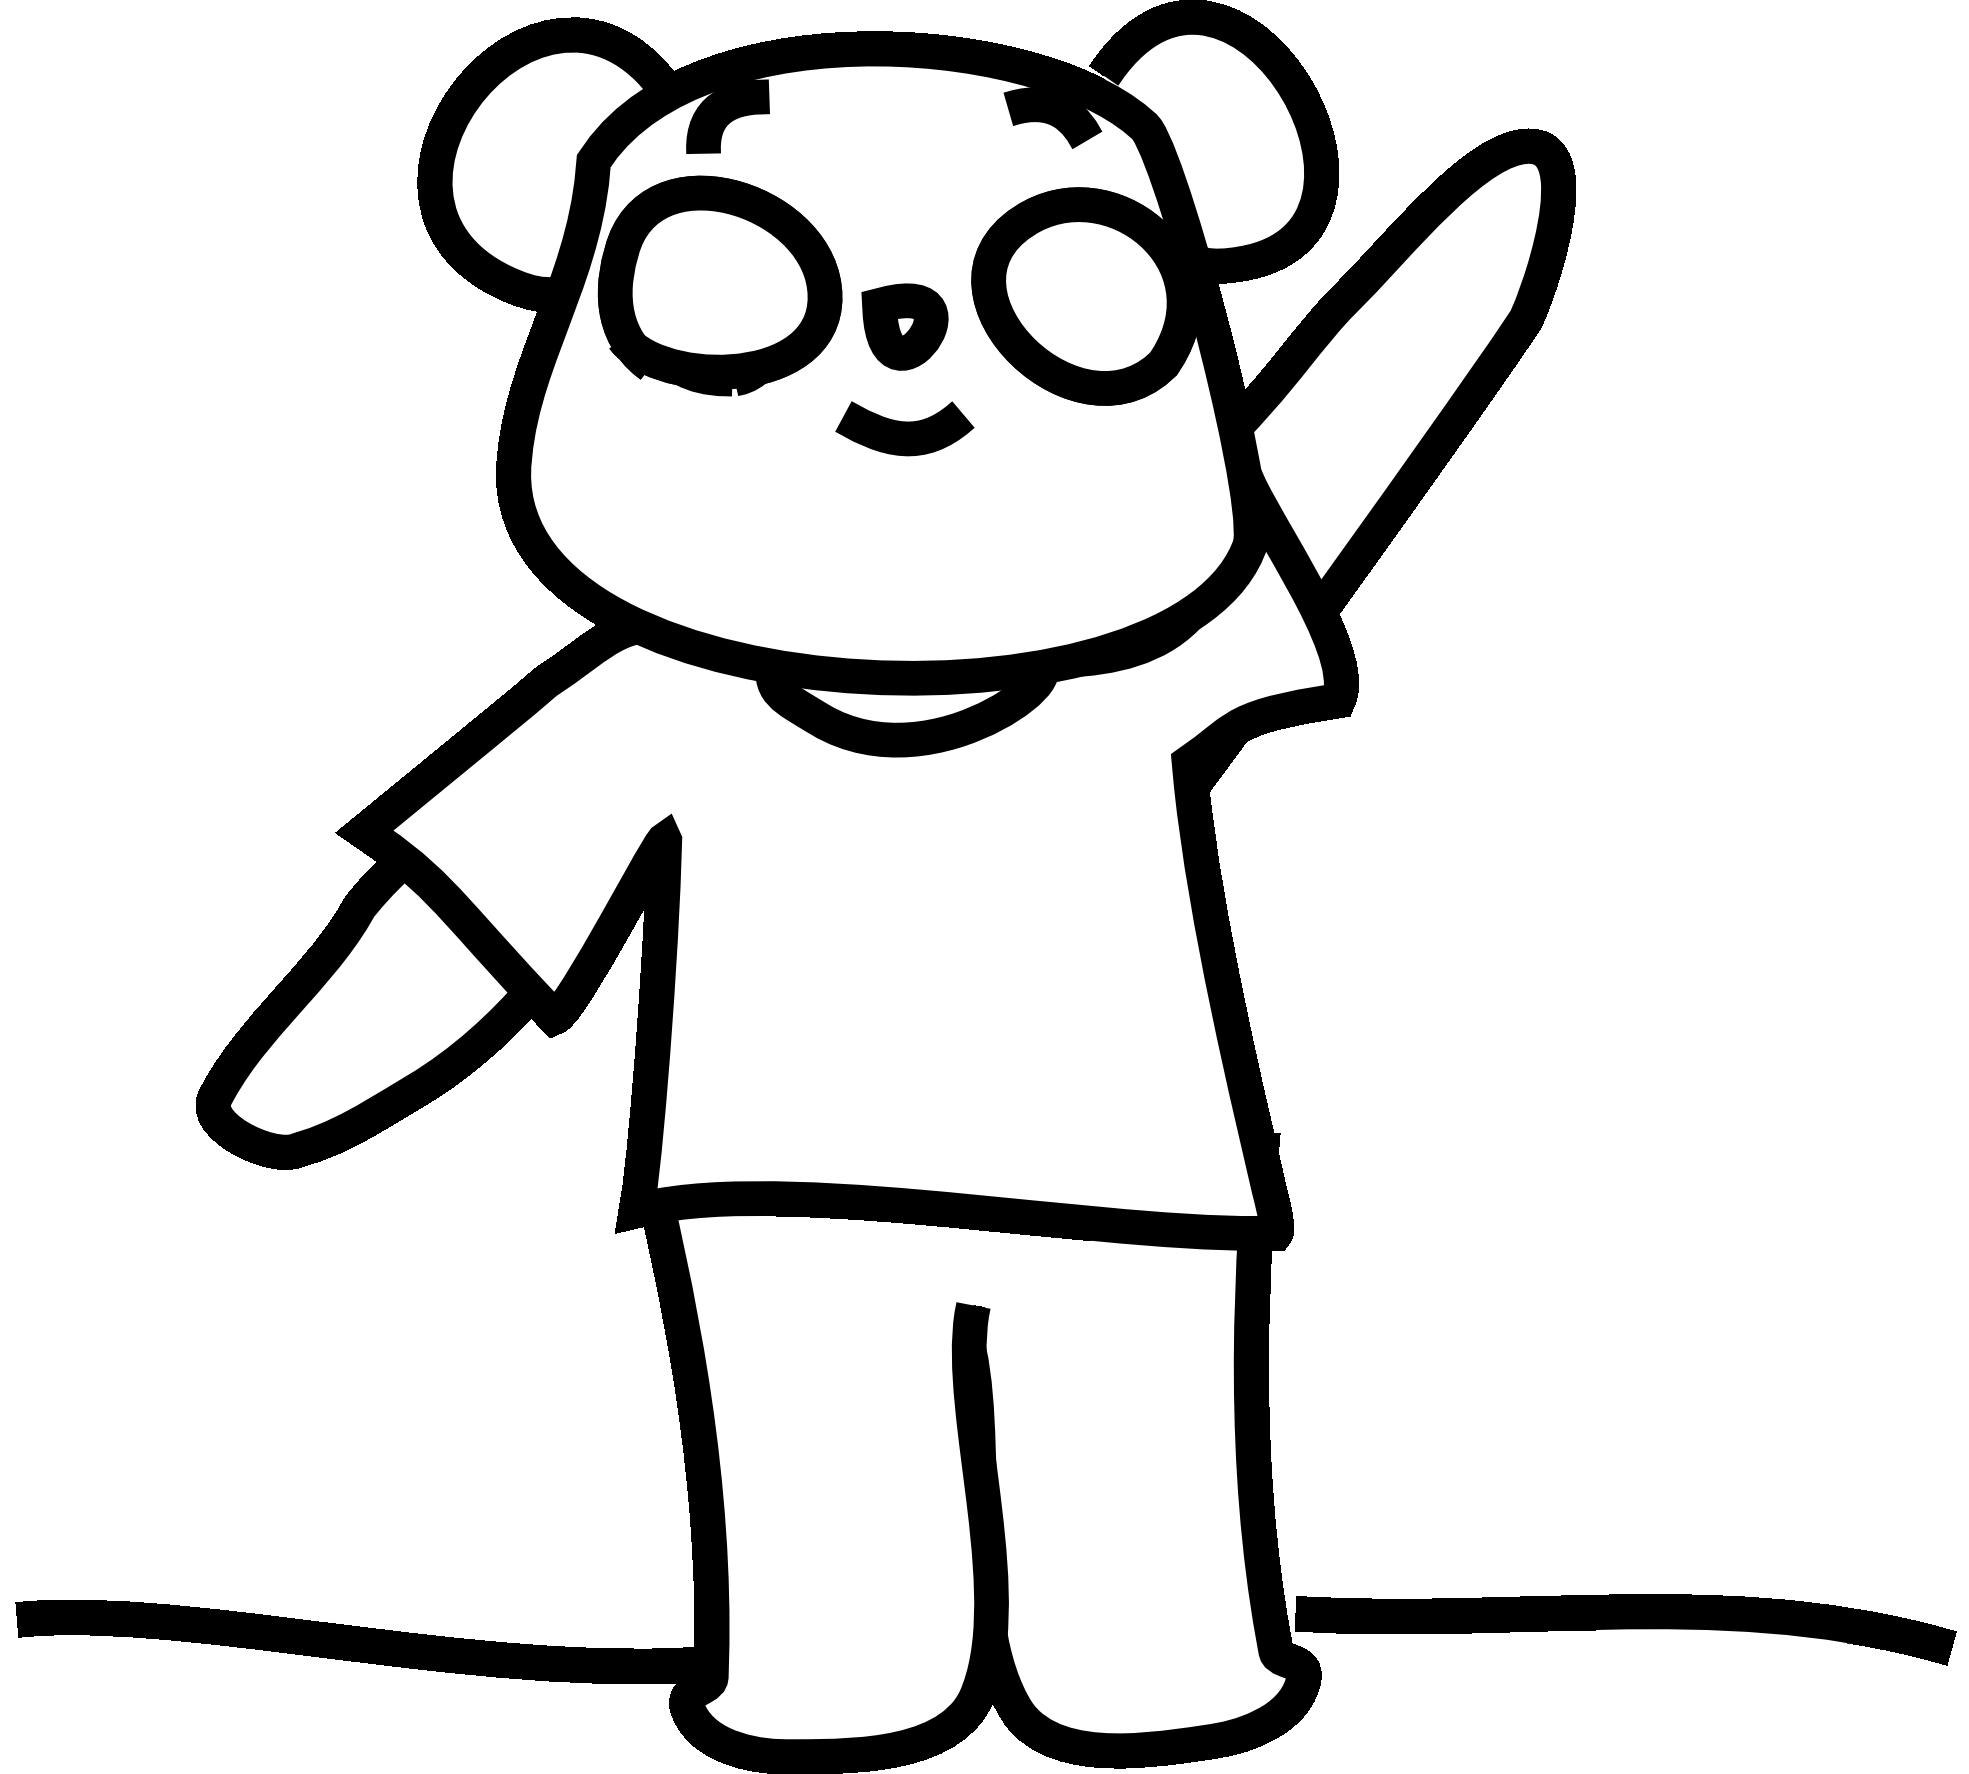 Teddy clipart stuffed animal #8